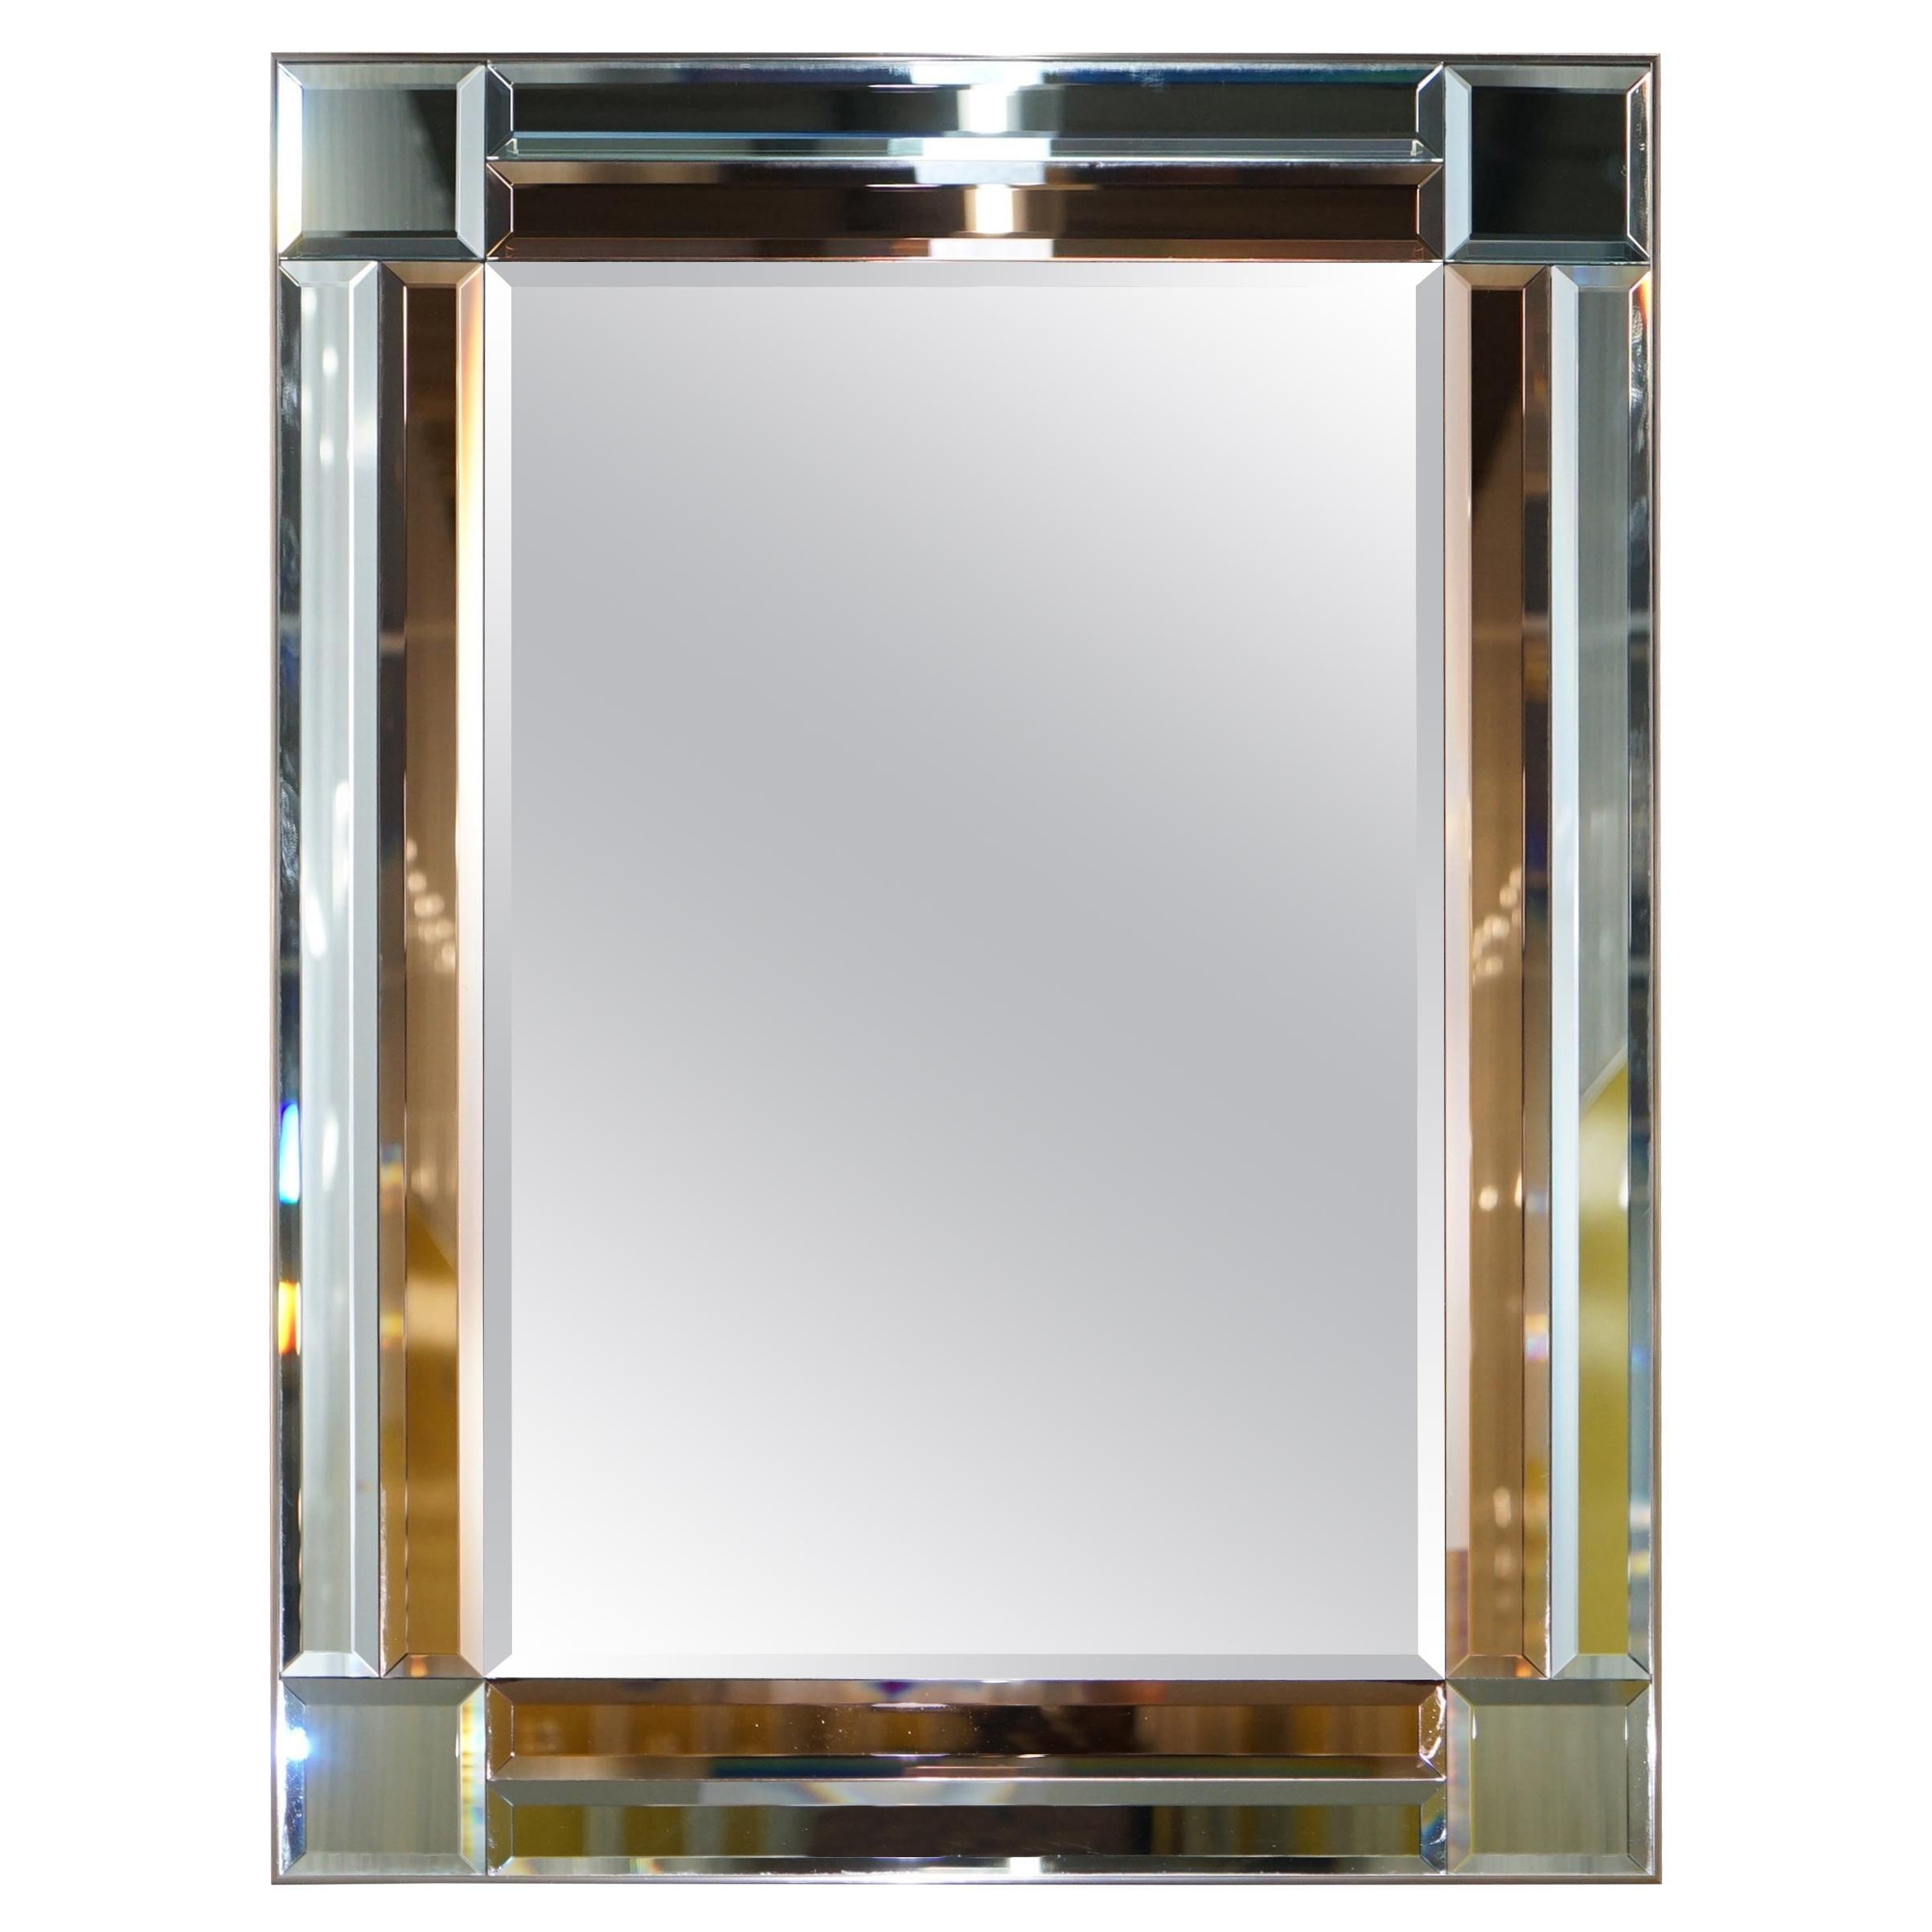 Super Rare 1930s Peach Glass French Art Deco Beveled Mirror Heavily Decorated